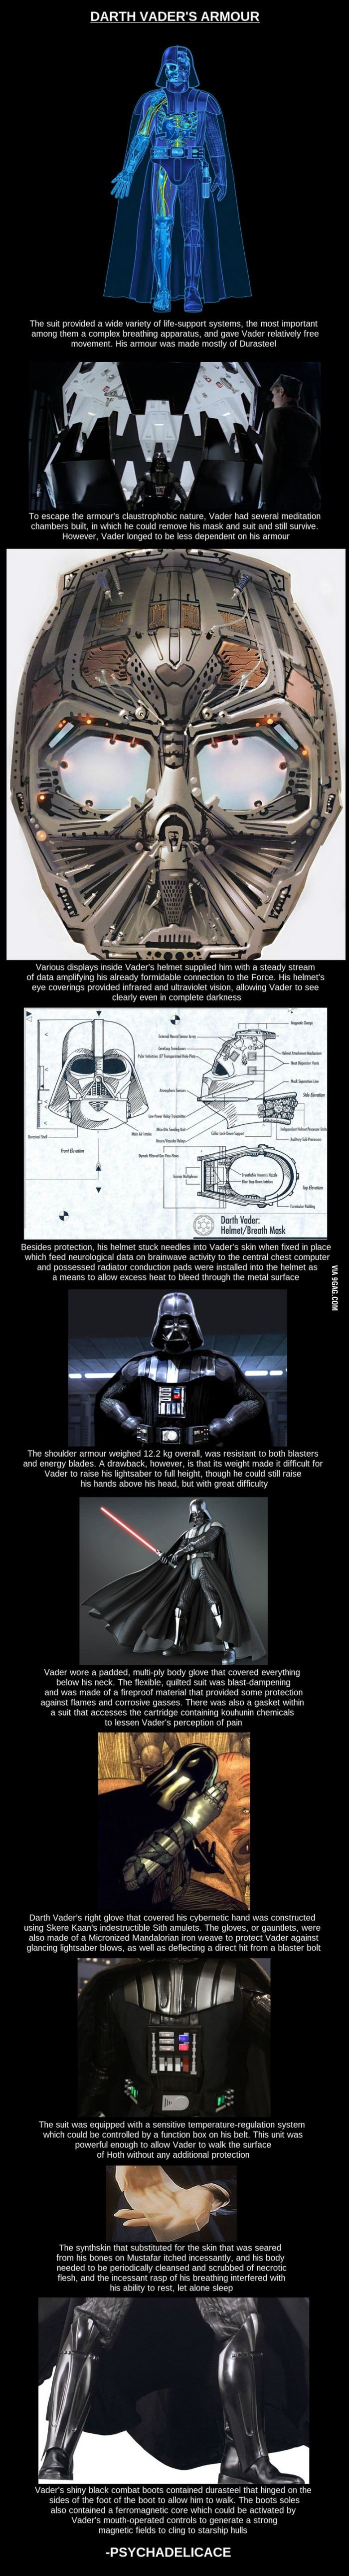 Darth Vader's Armor  #starwars